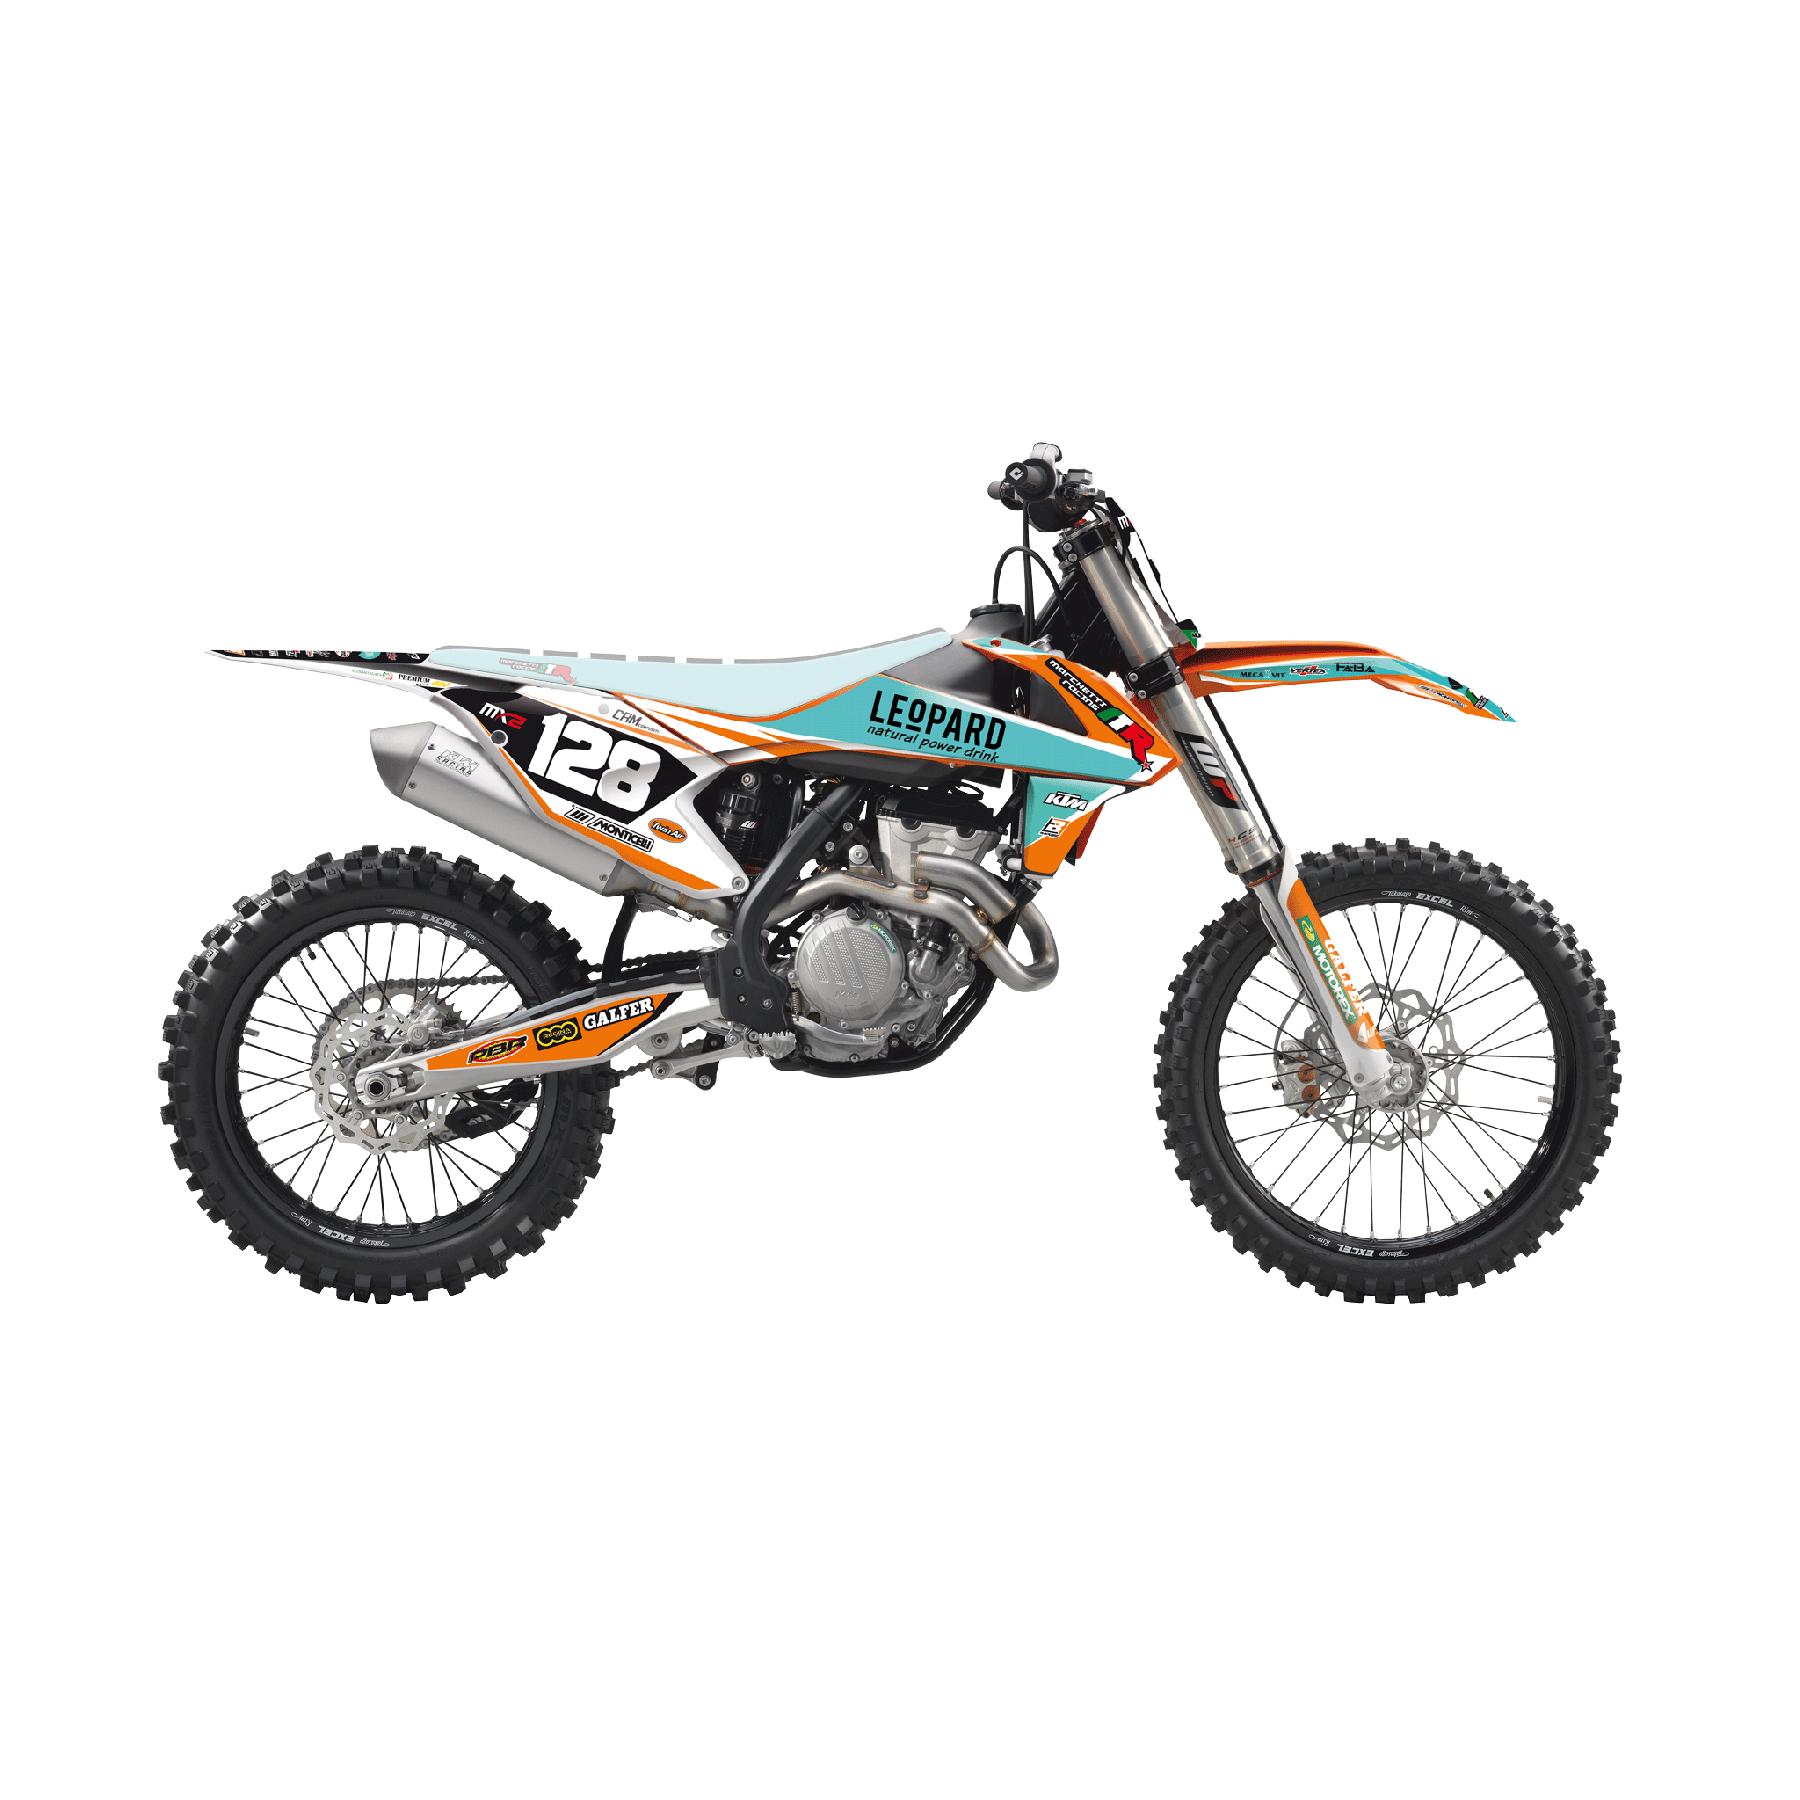 Blackbird Kit Adesivi Replica Ktm Marchetti Racing